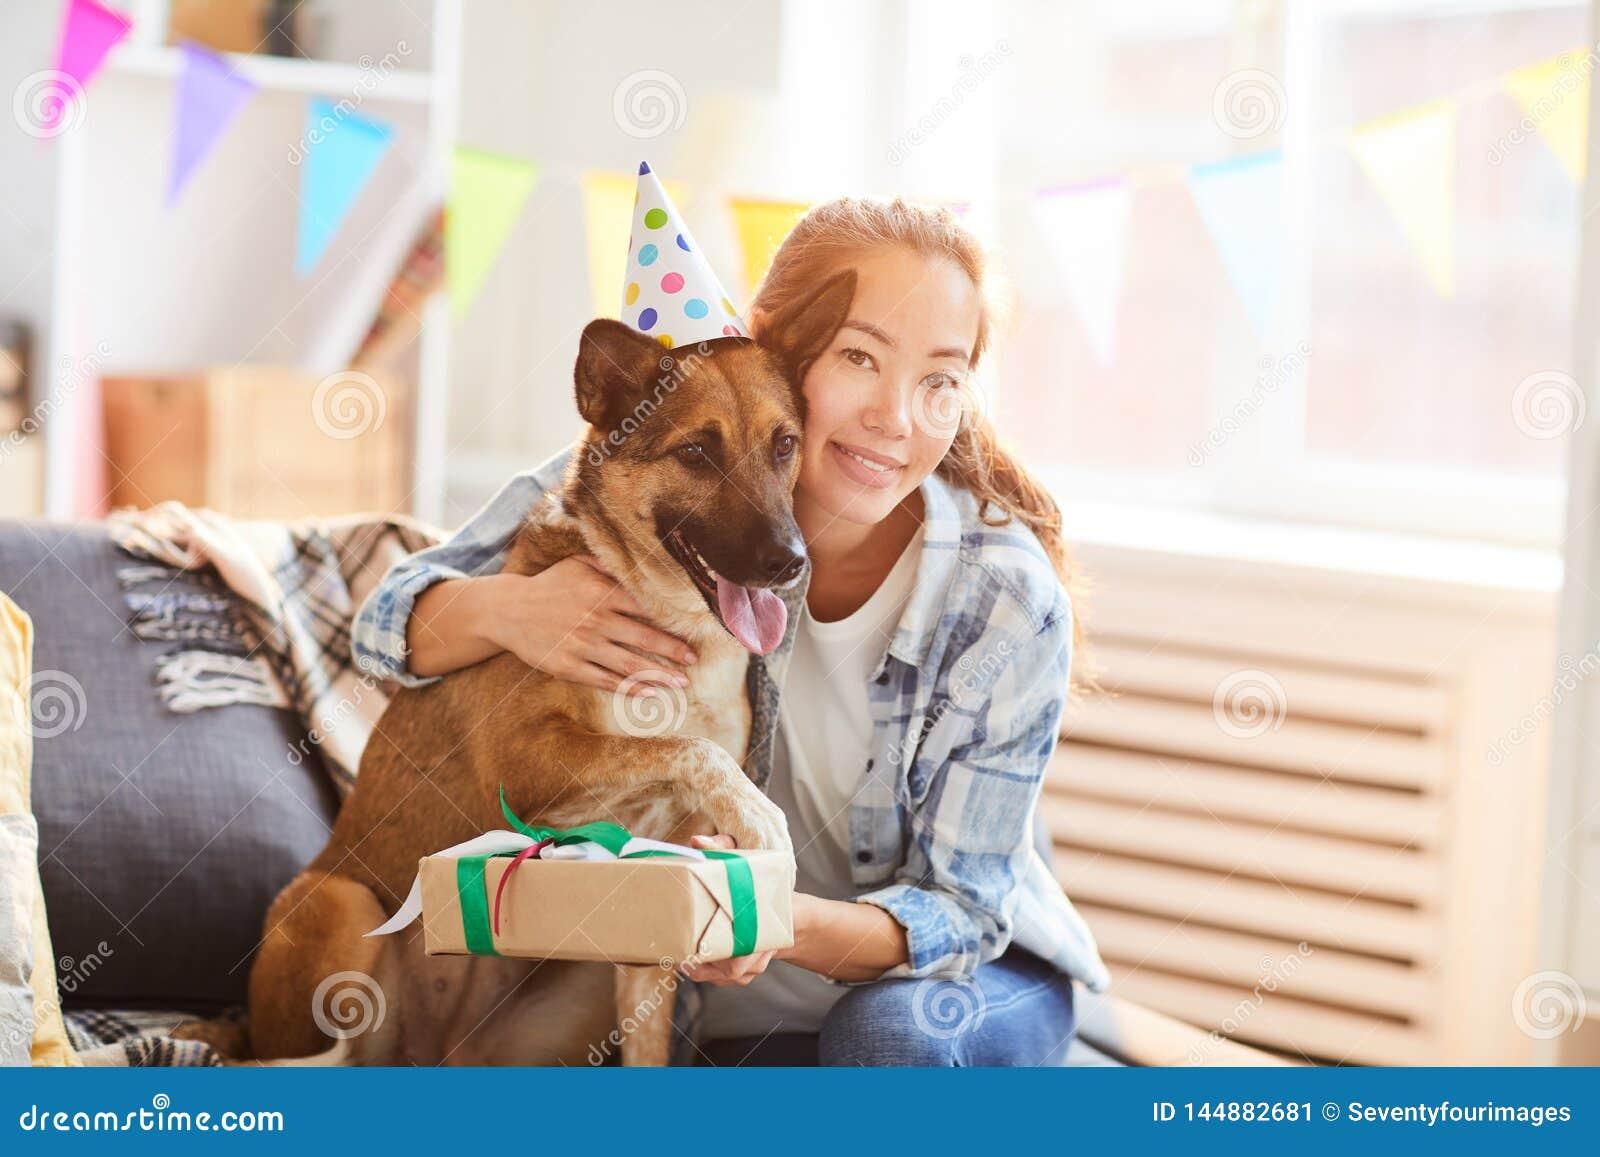 Fira hundfödelsedag